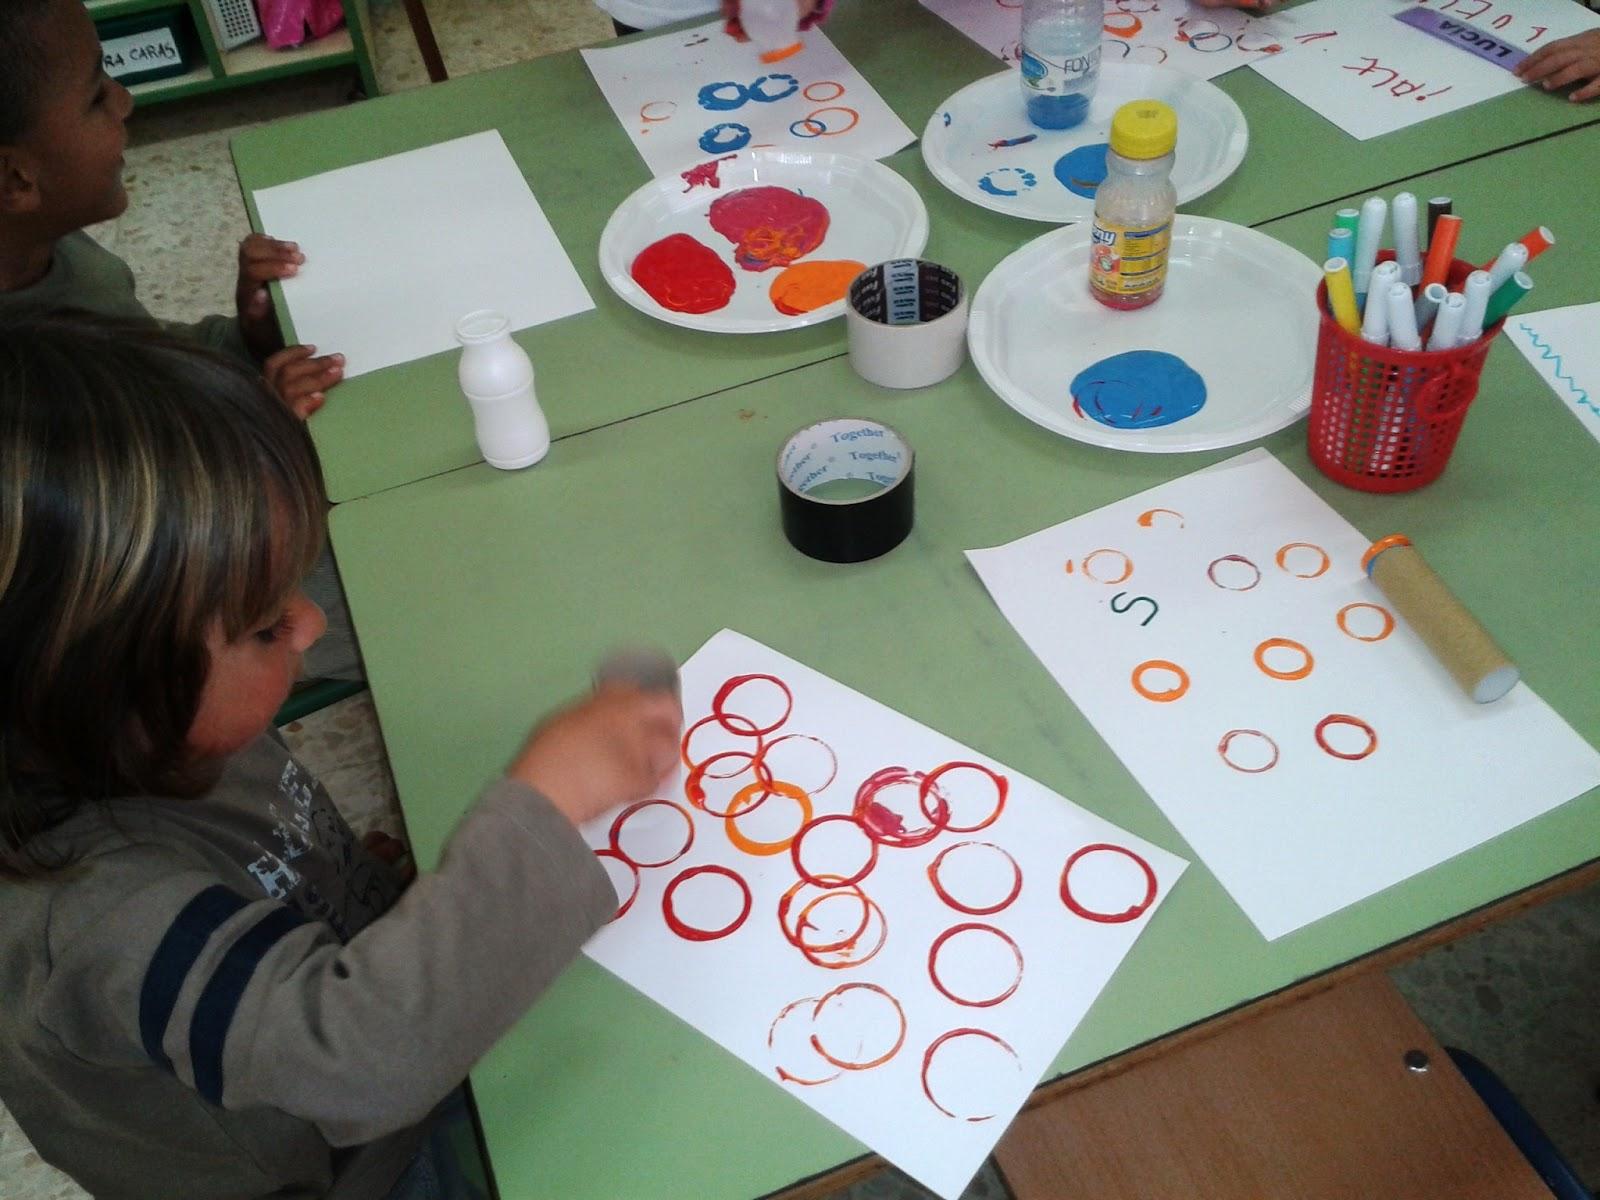 Aventura diminuta m s t cnicas art sticas para la clase for Actividades para el salon